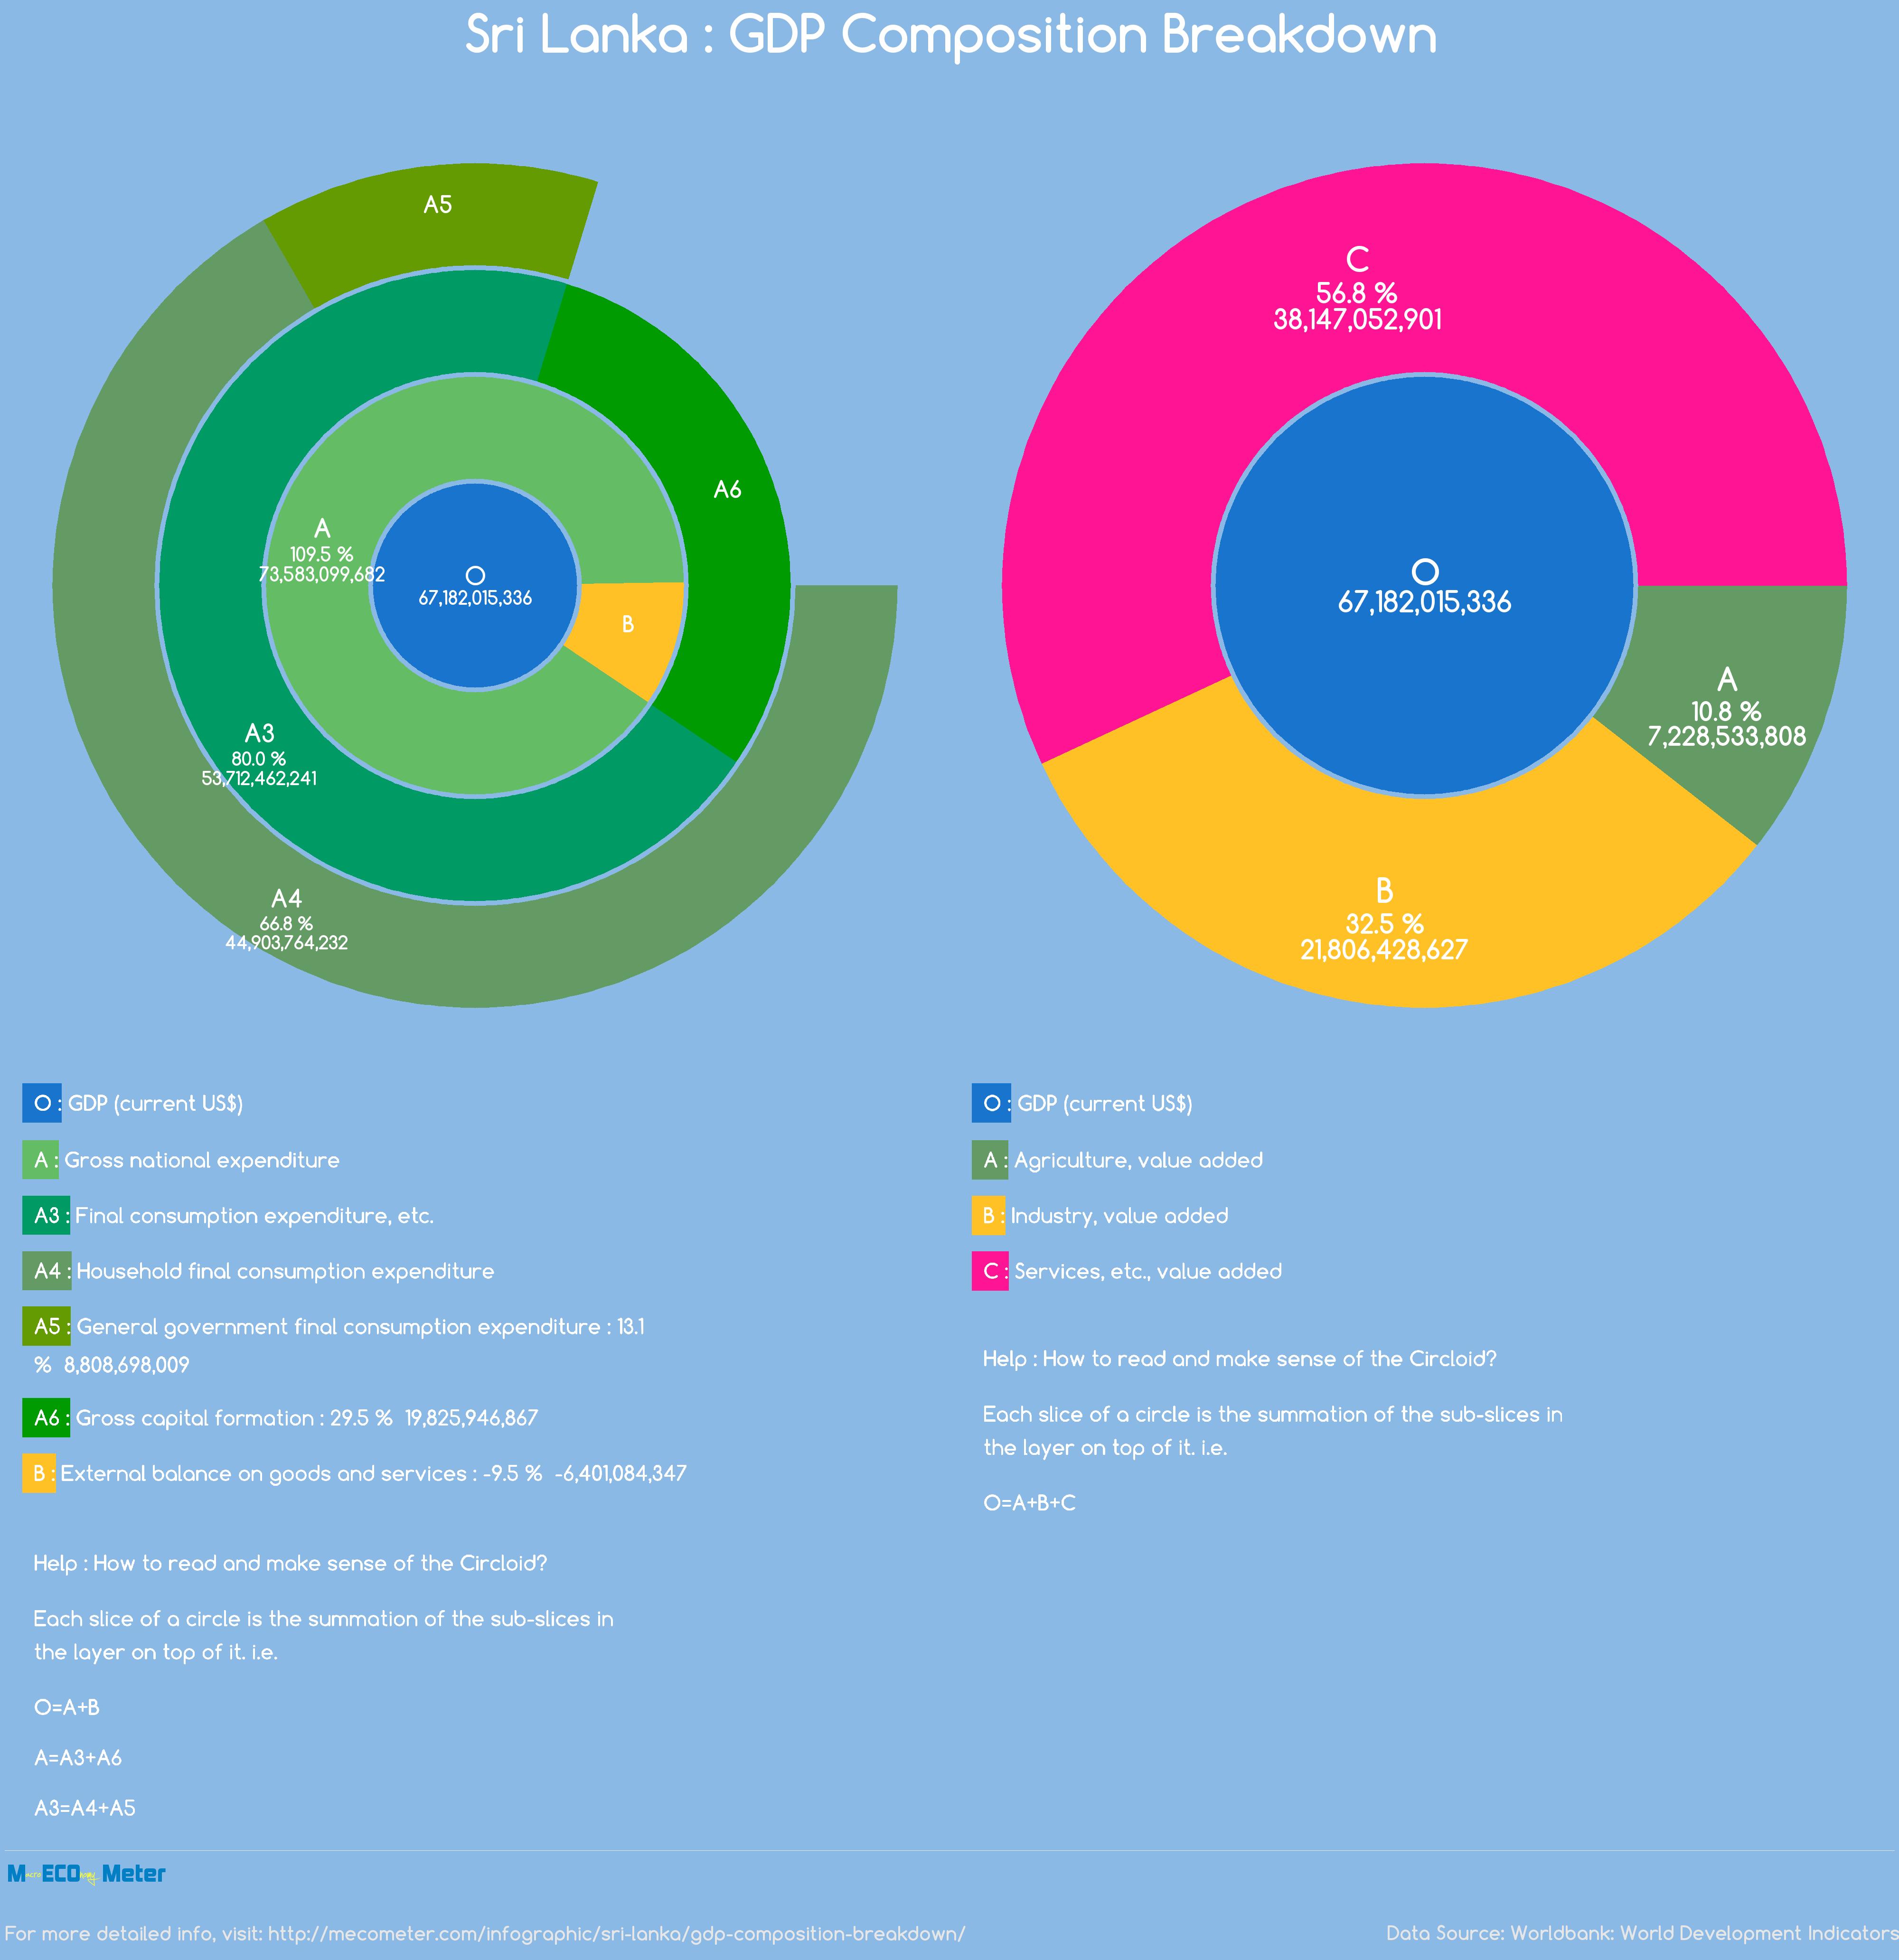 Sri Lanka : GDP Composition Breakdown